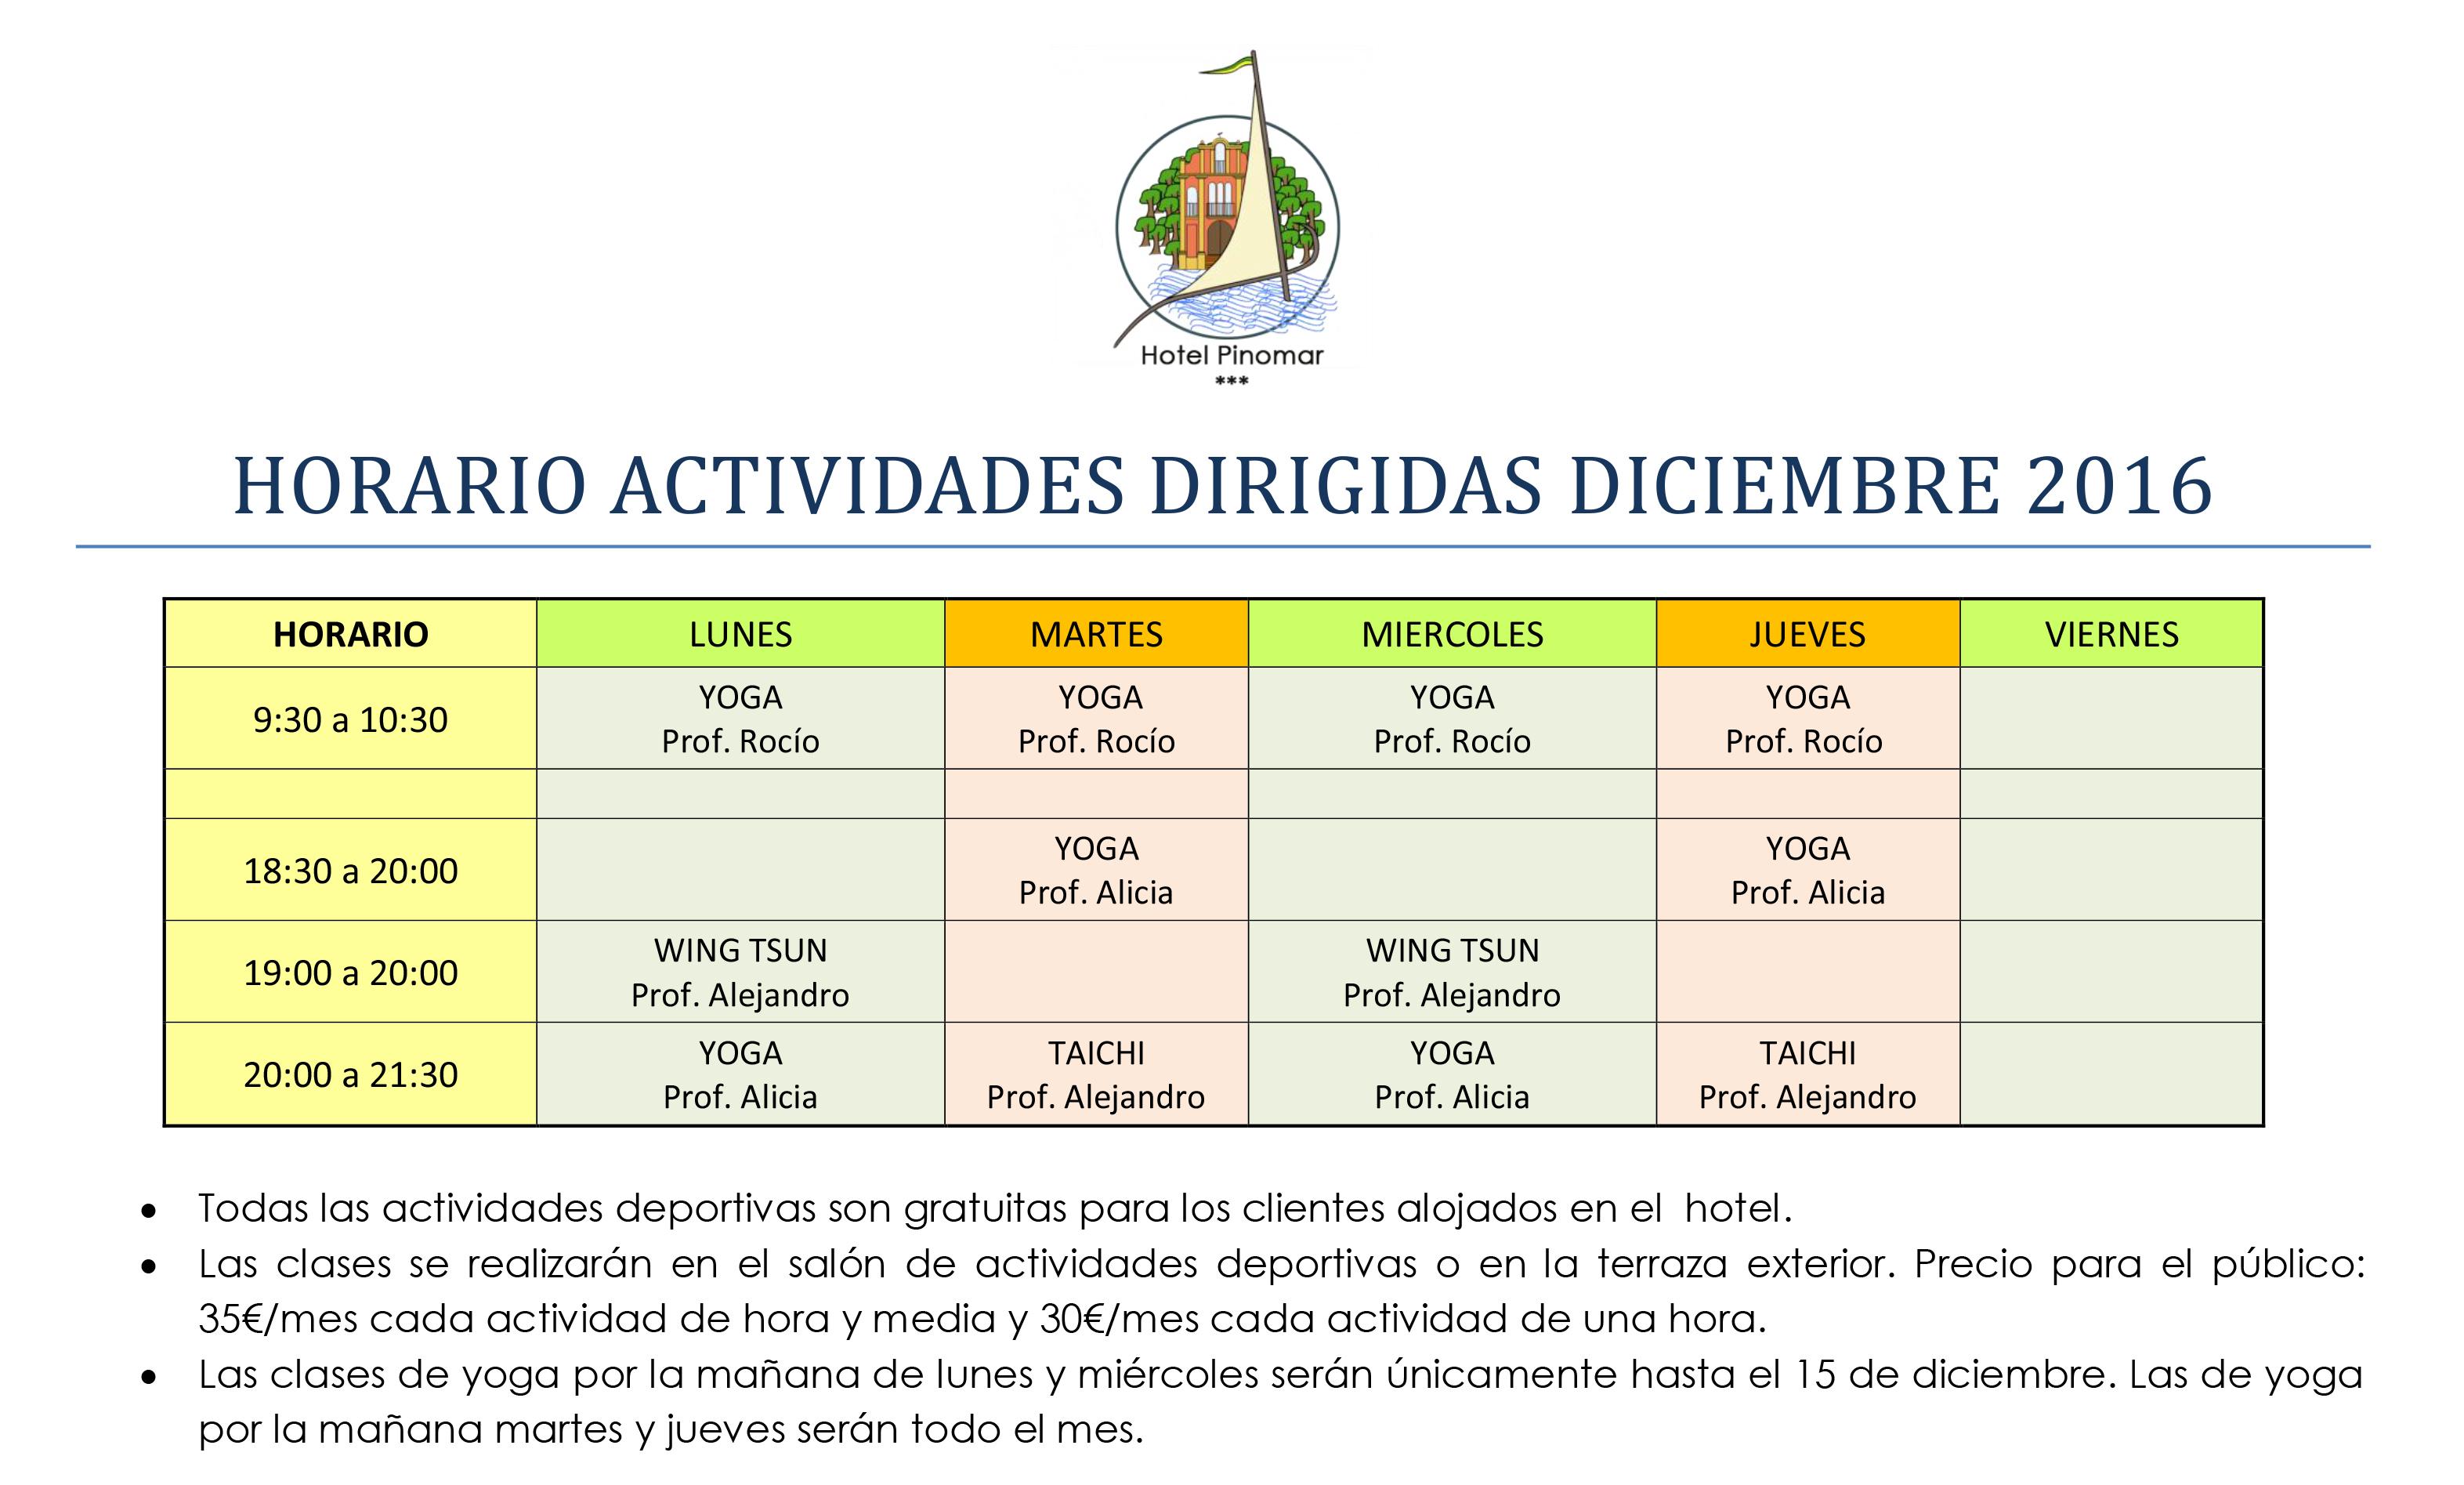 horario-actividades-dirigidas-diciembre-2016